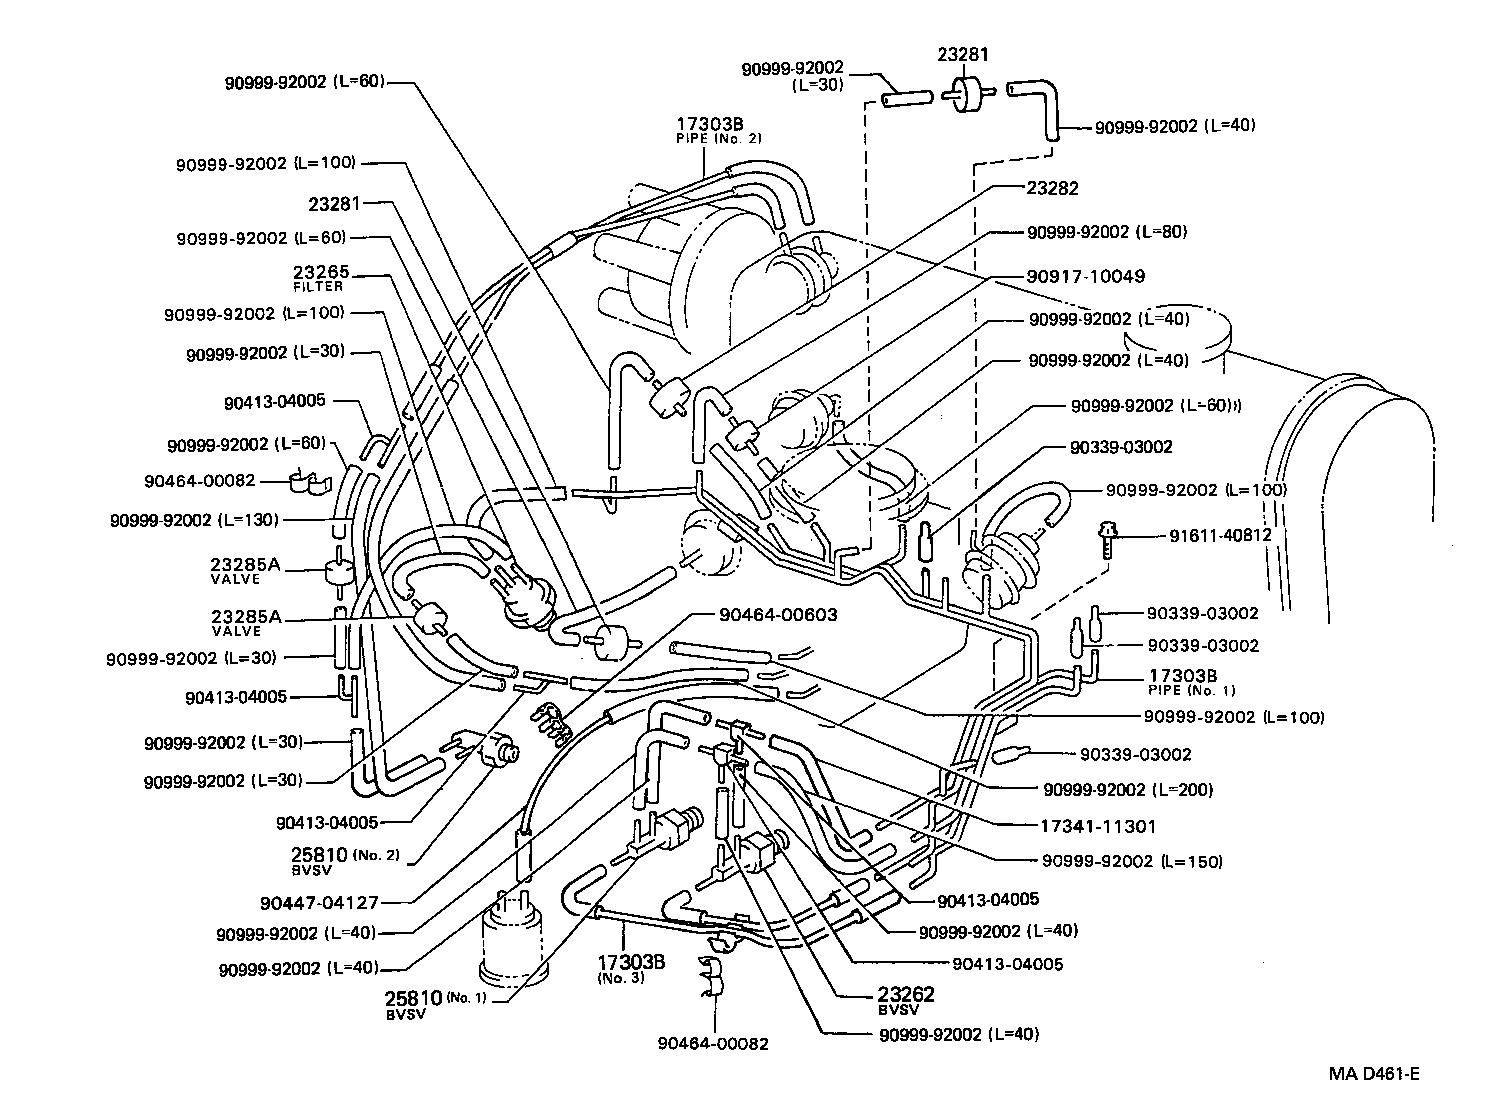 toyota starletep81l-ahmnsw - tool-engine-fuel